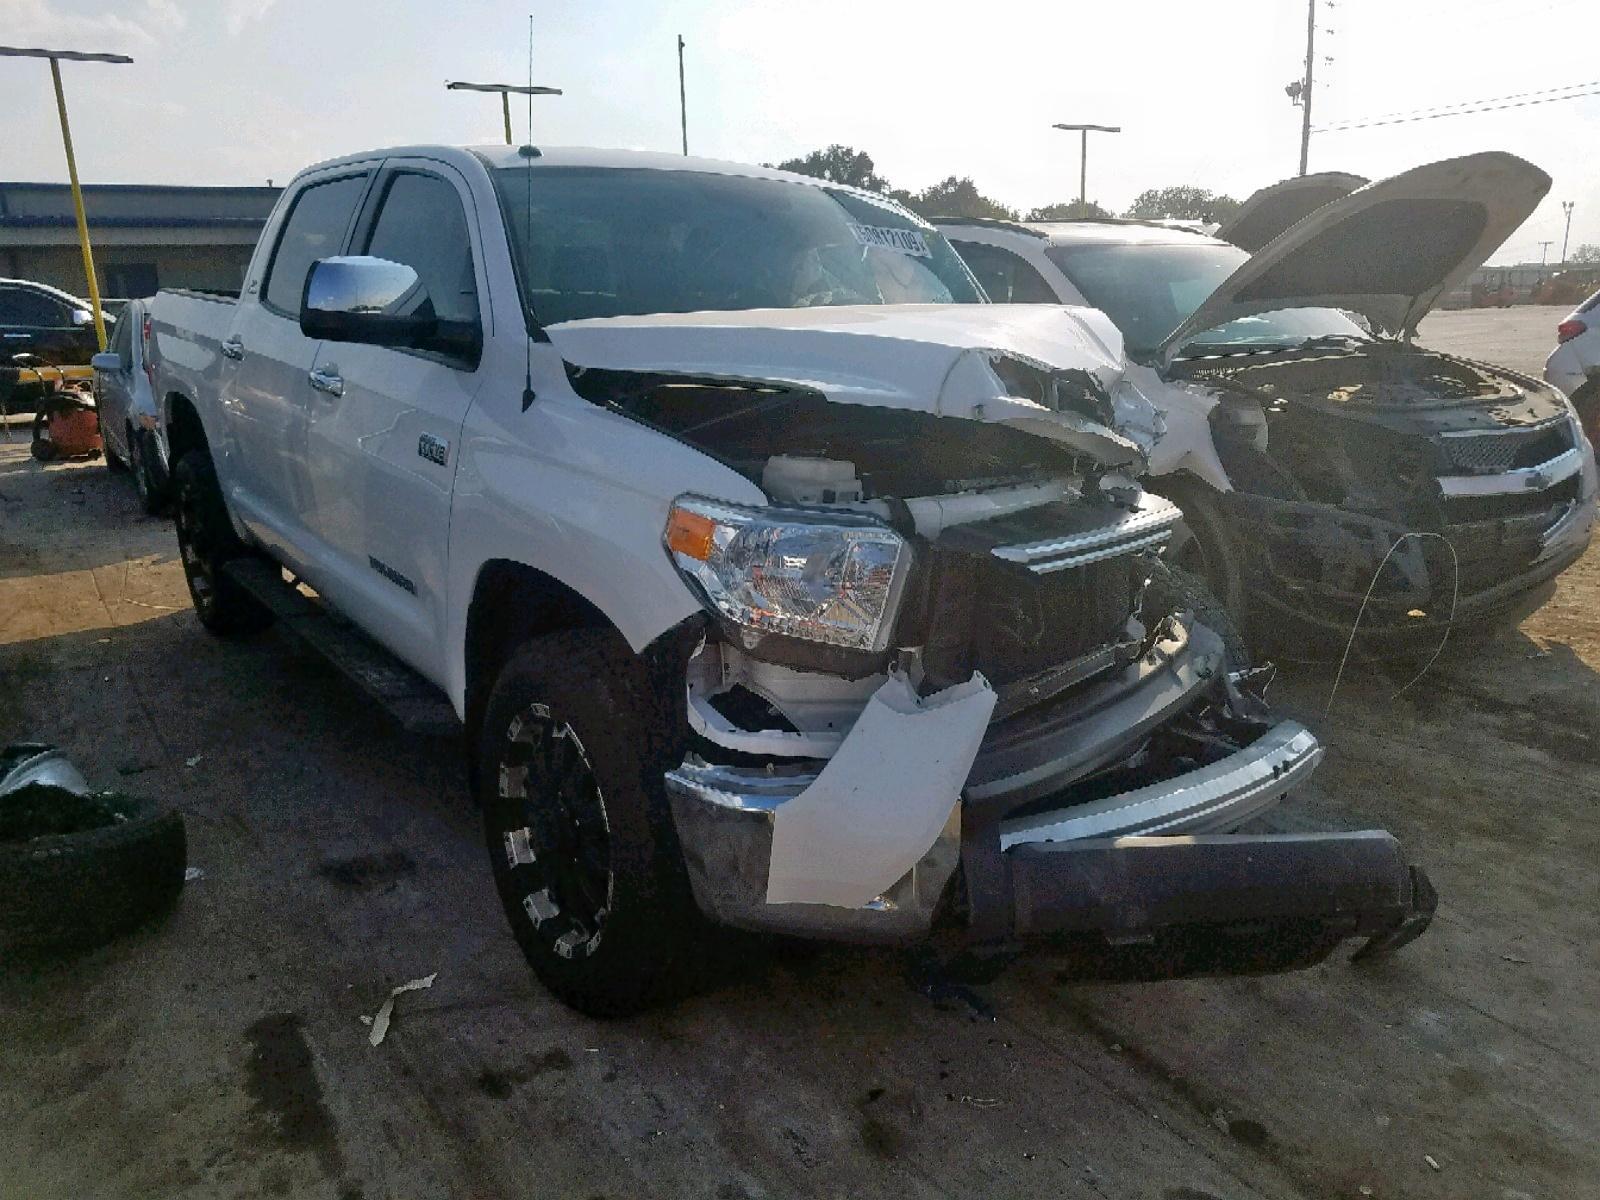 2017 Toyota Tundra CRE